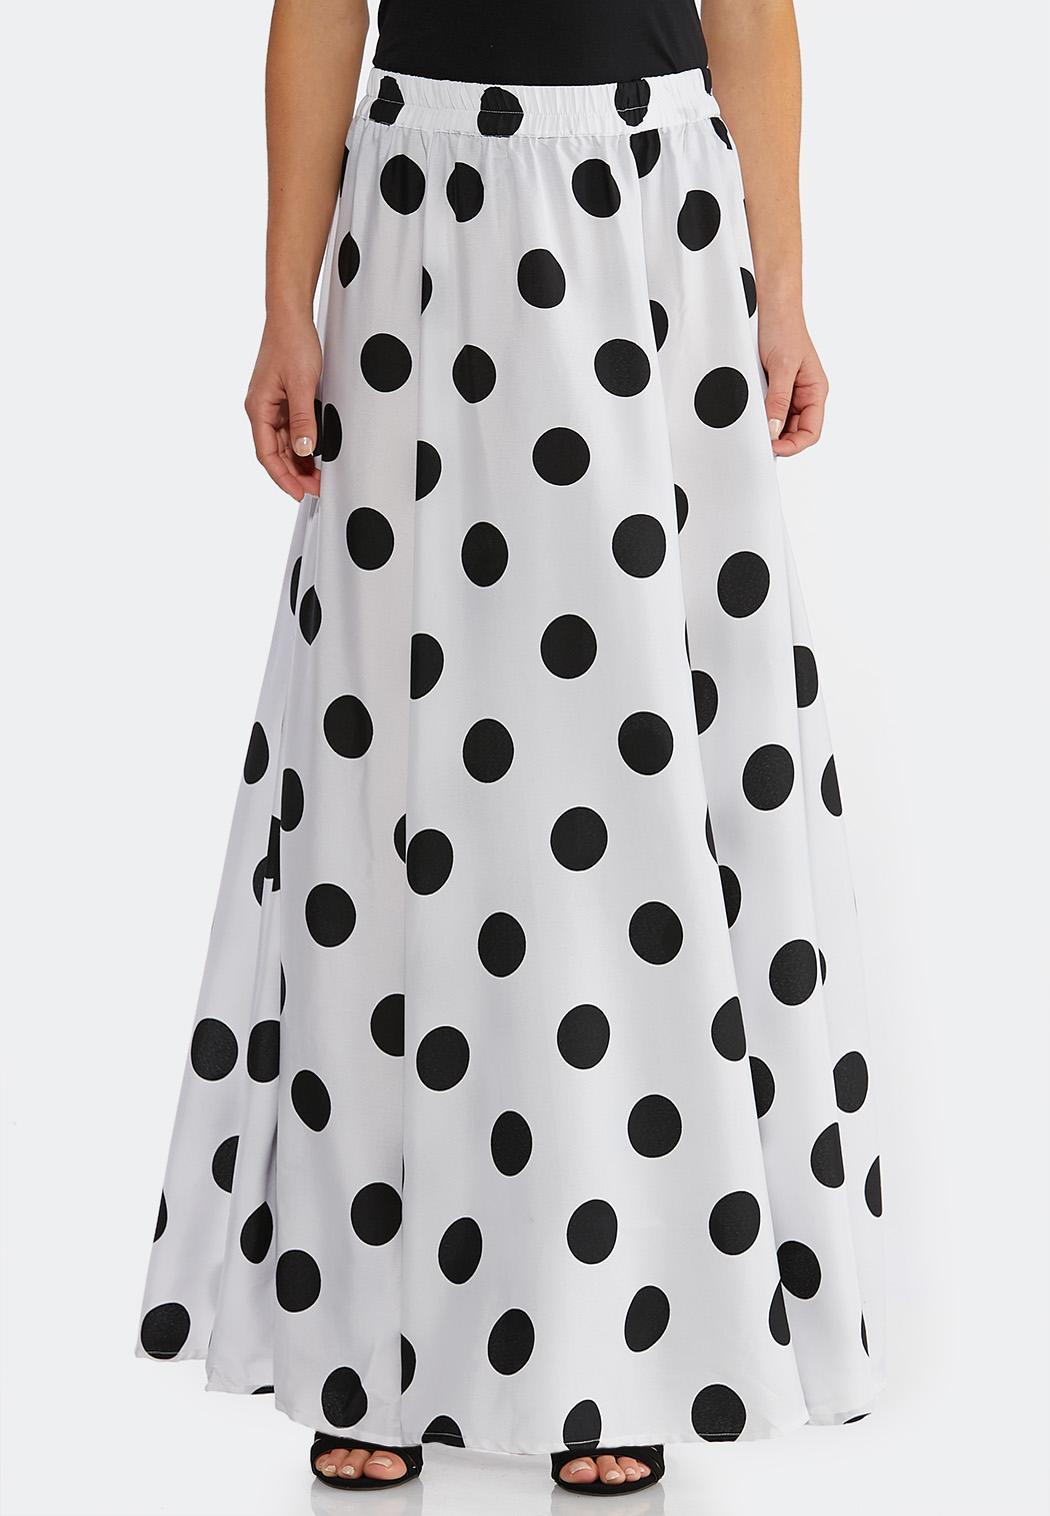 2a9ac87889 Women s Plus Size Skirts